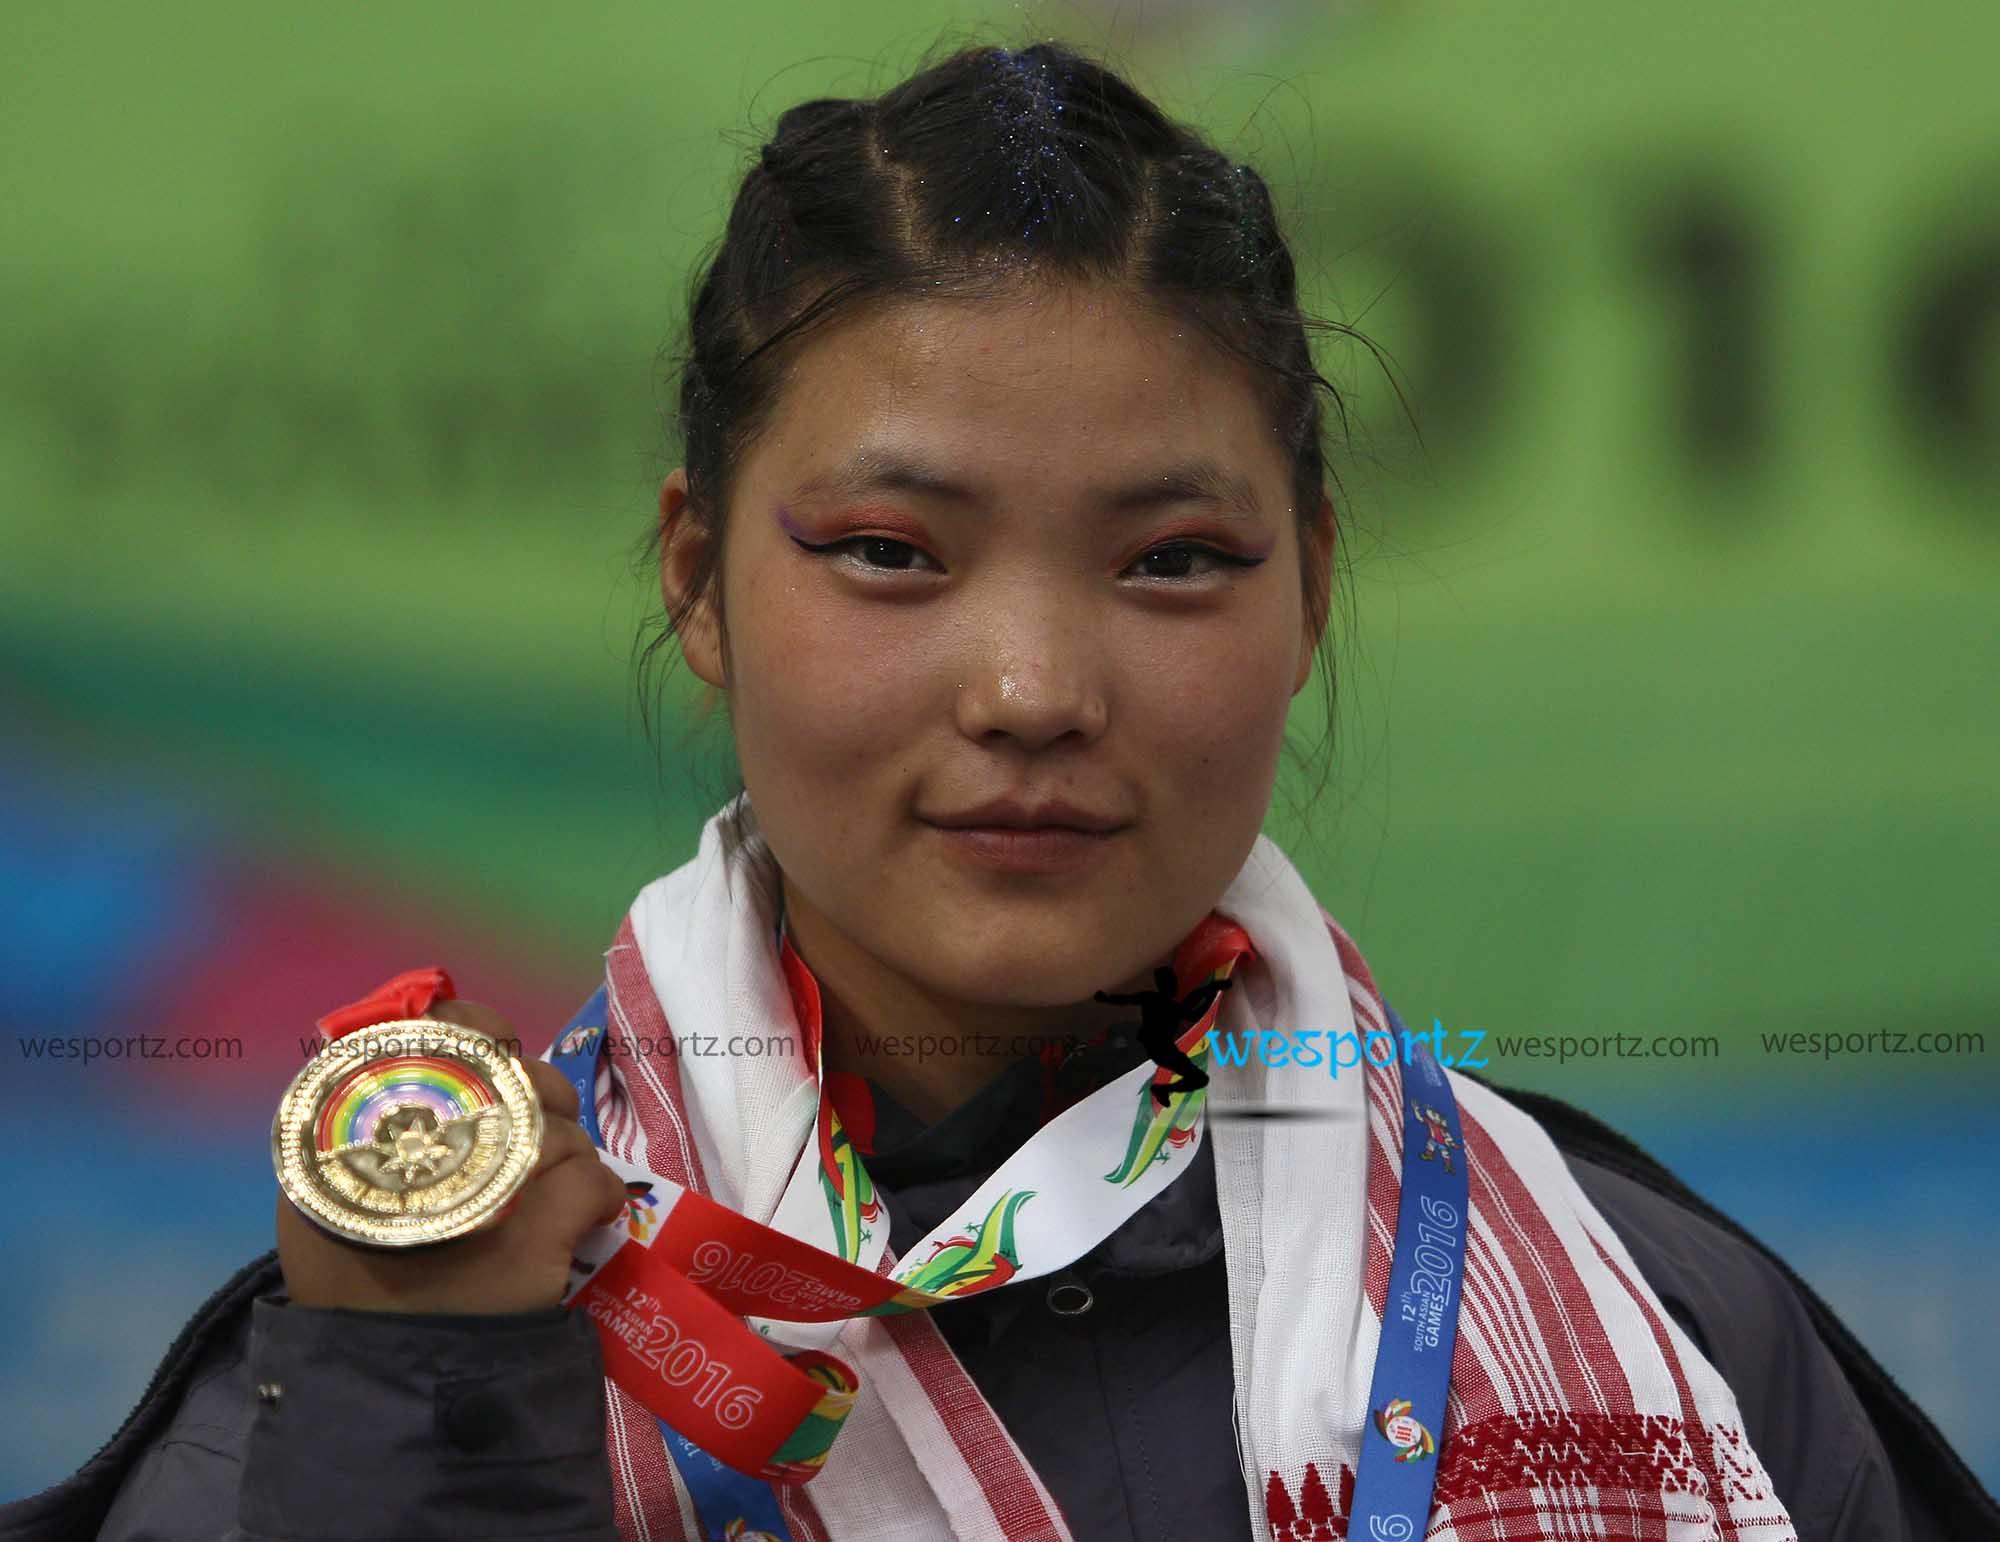 Nima gharti magar, Nima gharti magar wushu player, gold medal for nepal,